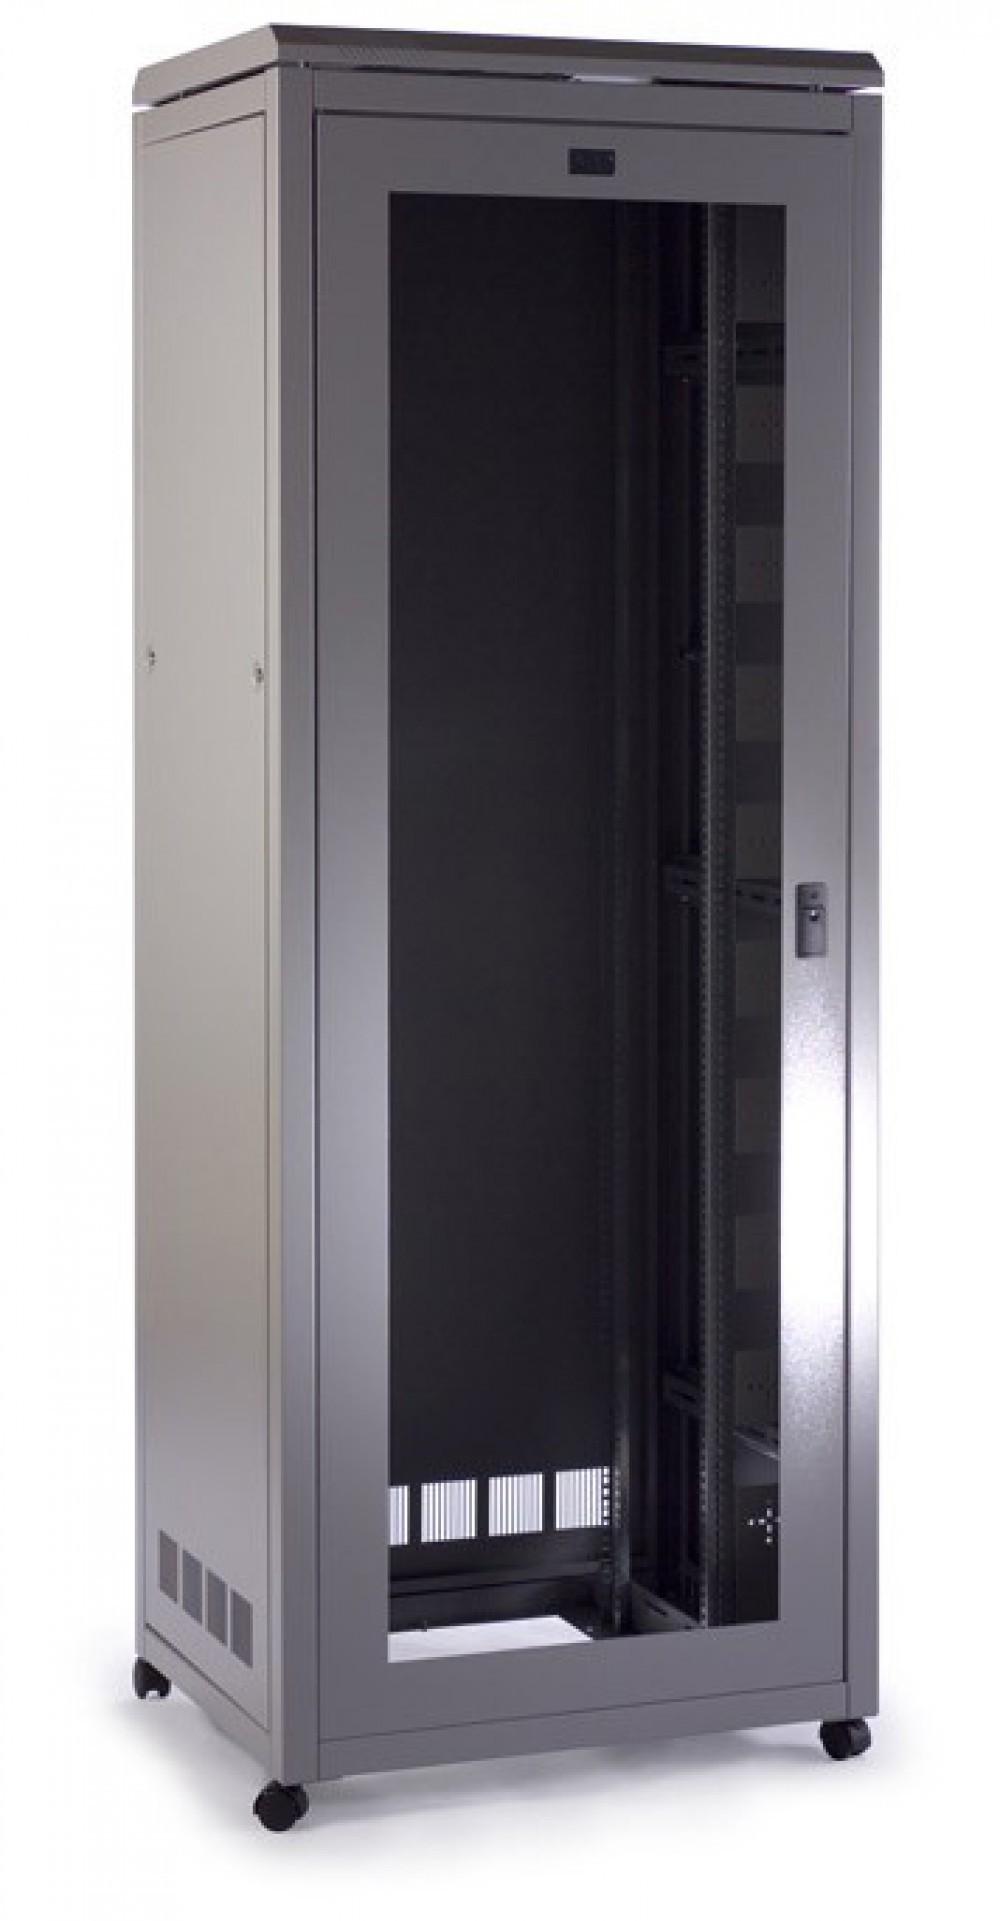 Prism Free Standing Cabinet 42U (2070x800x800)